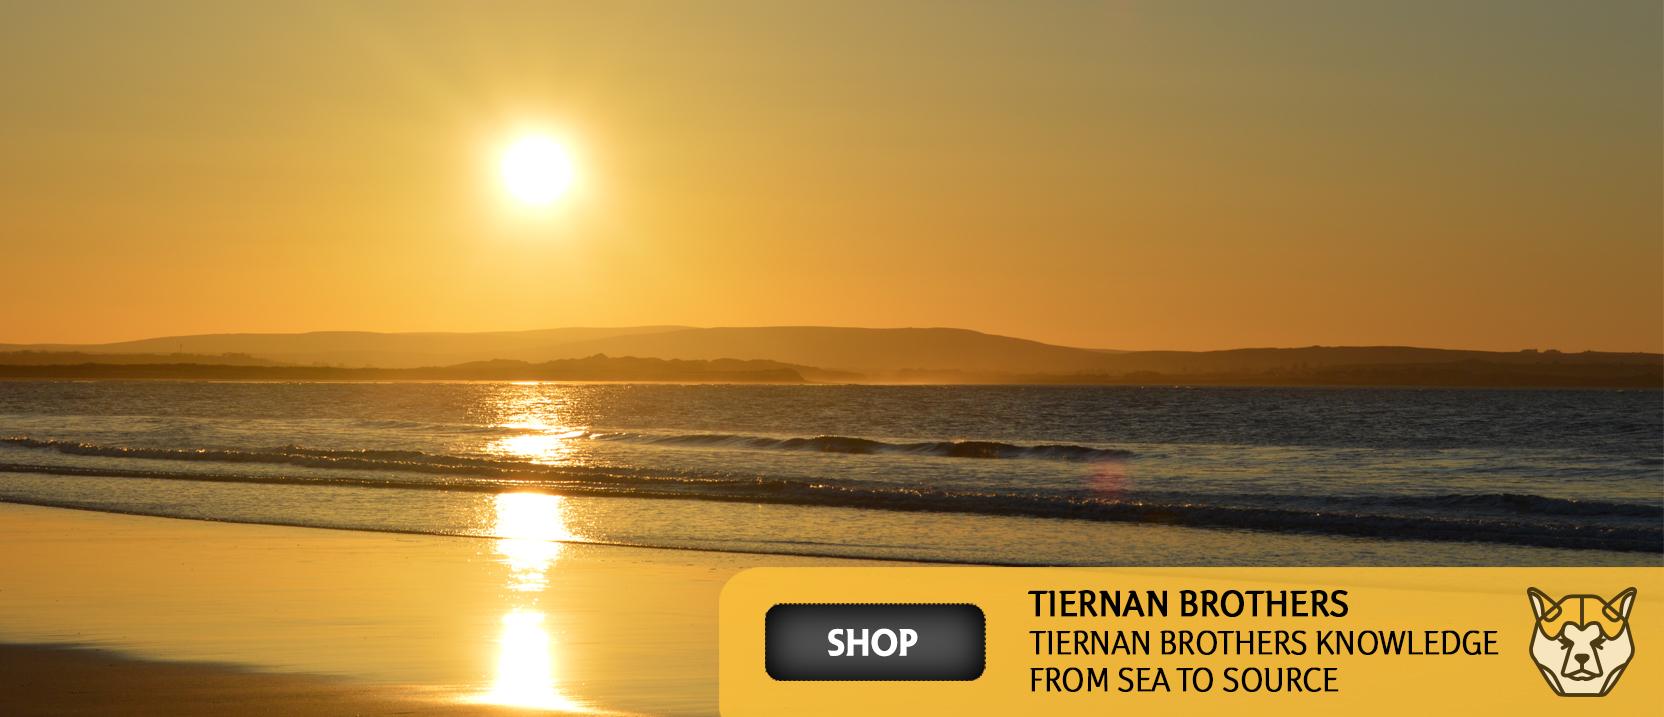 Tiernan-Brothers-Shop